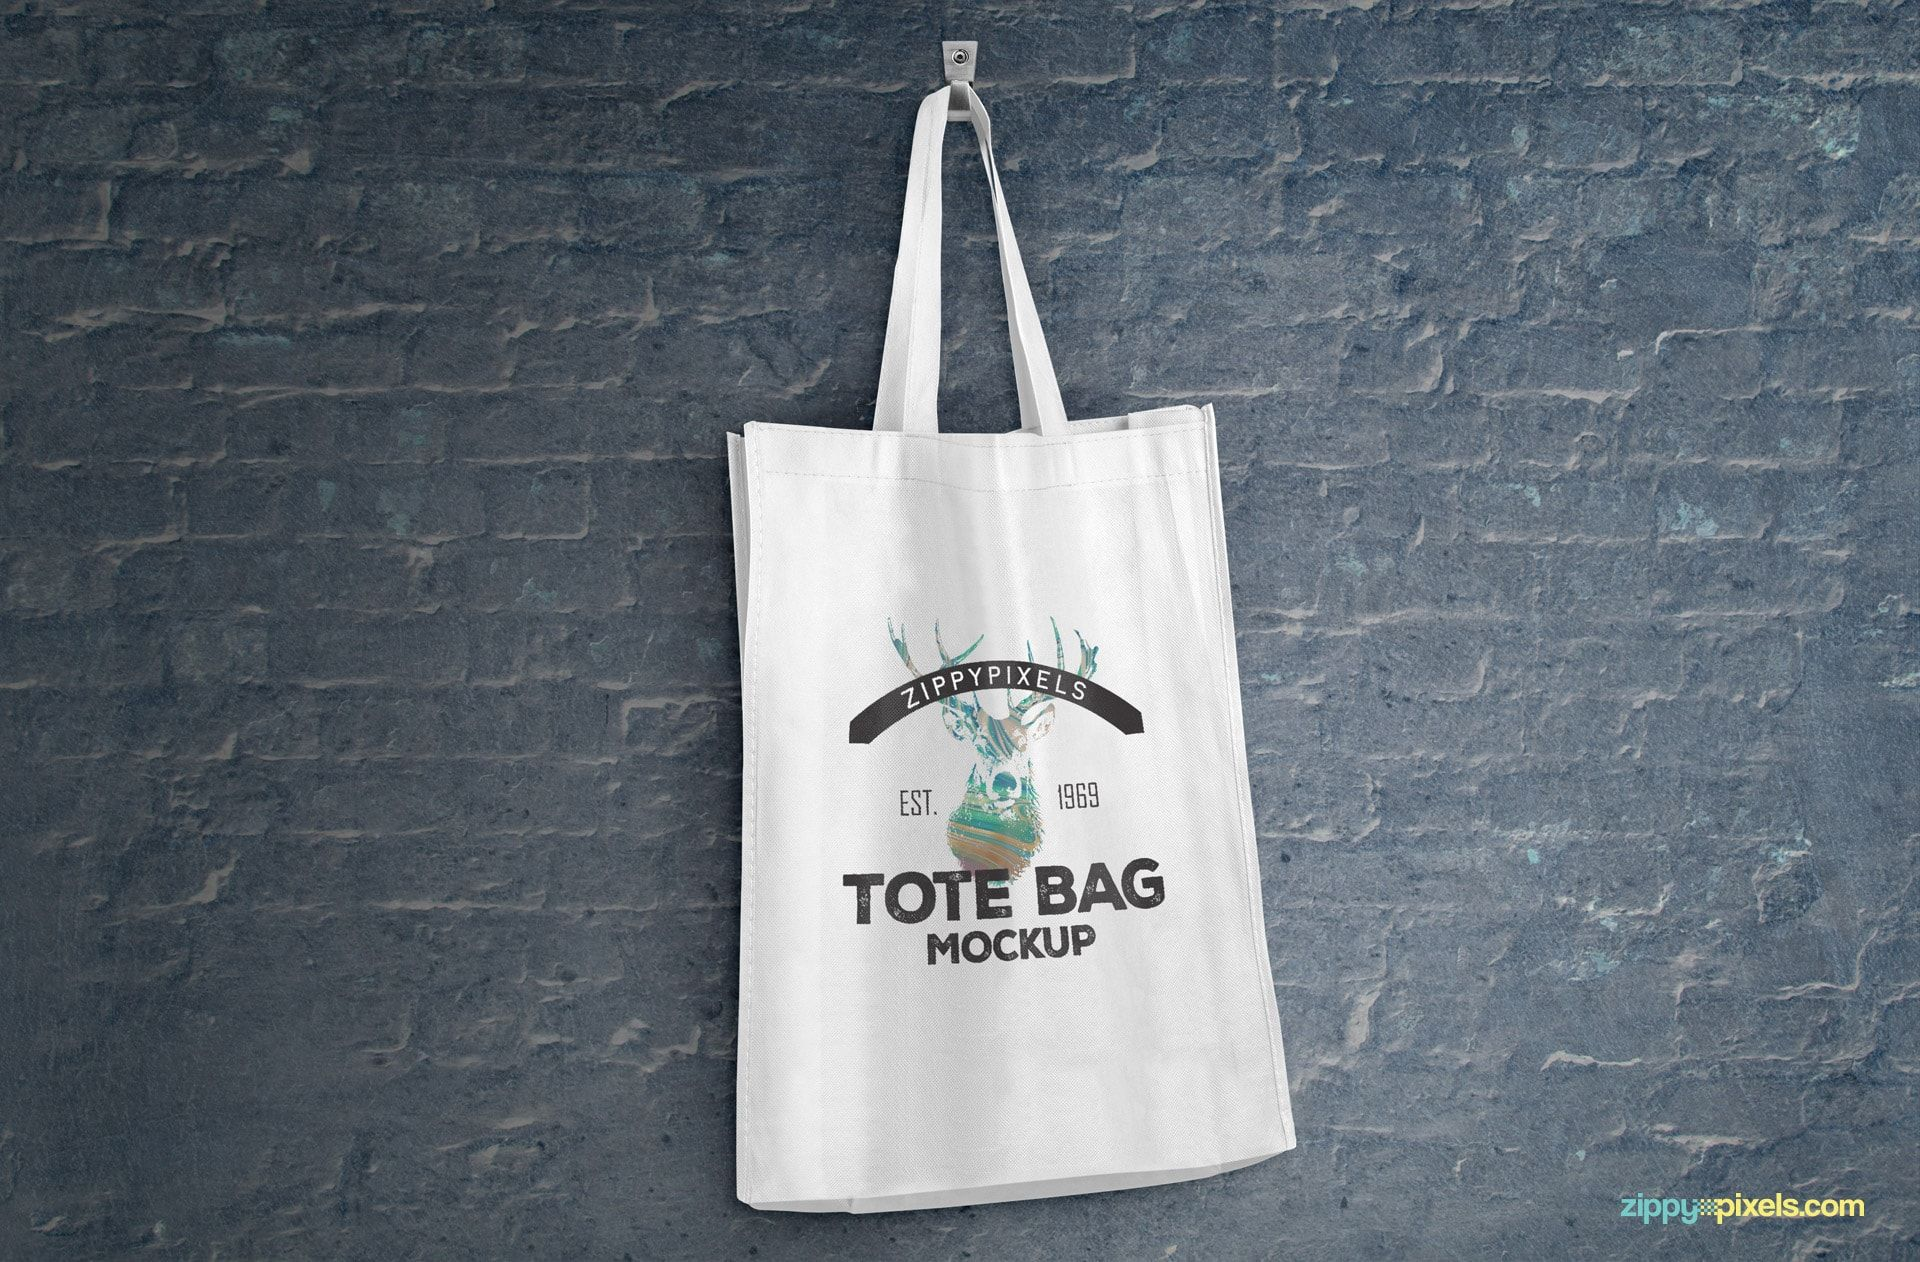 Download Tote Bag Mockups Free Psd Download Zippypixels Bag Mockup Free Tote Mockup Free Psd